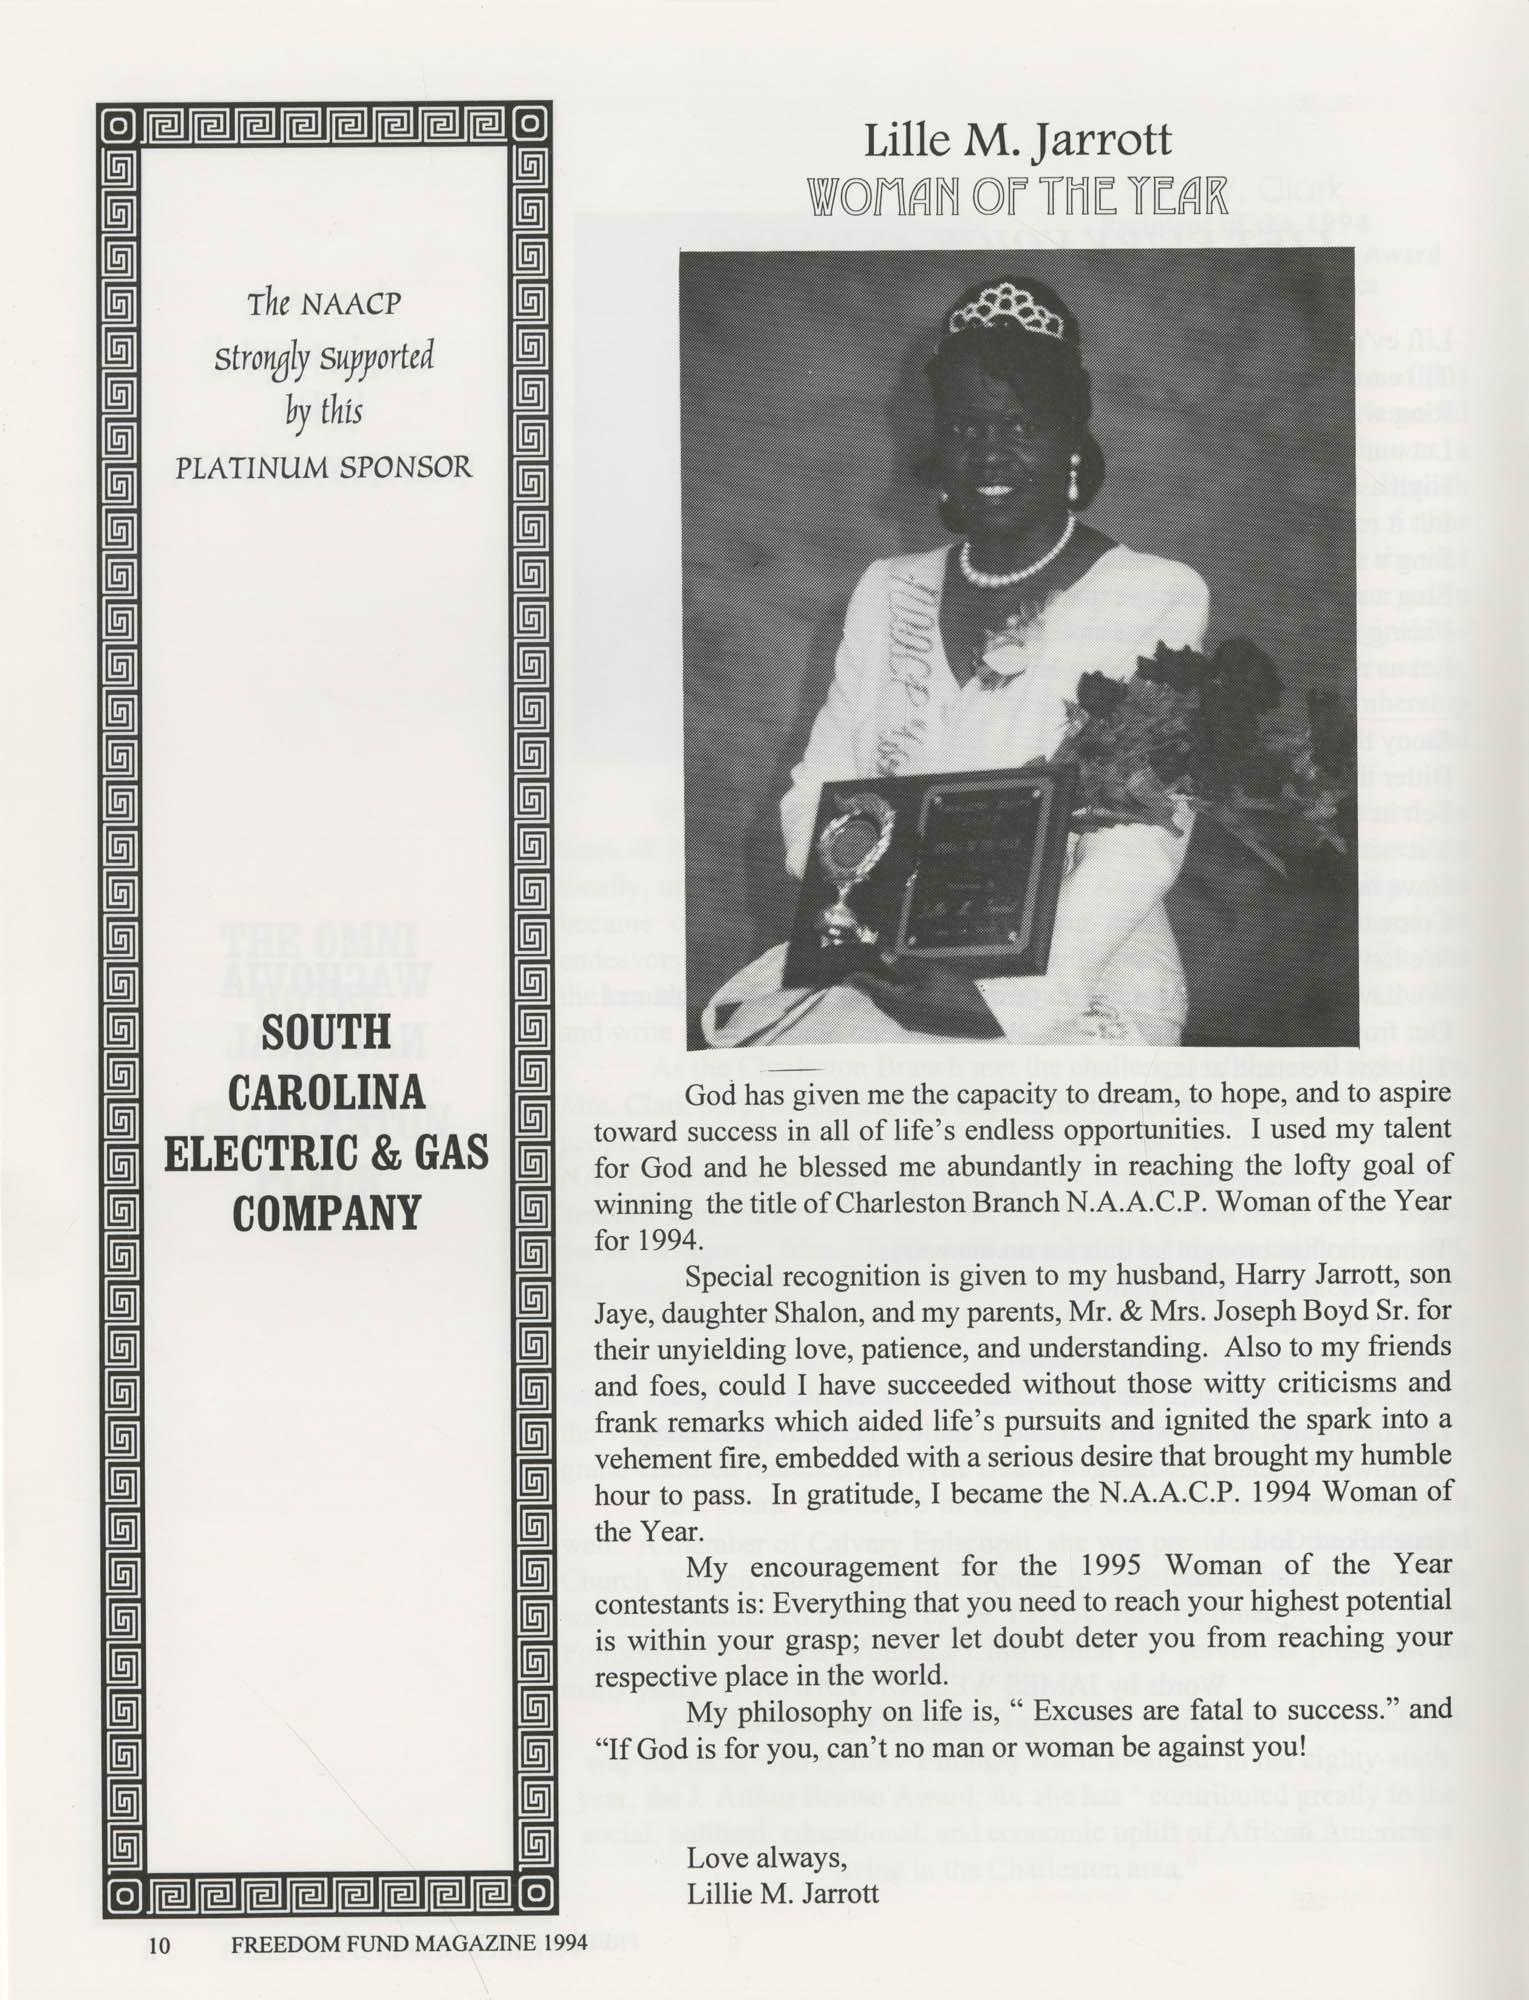 Freedom Fund Magazine, 1994, Page 10